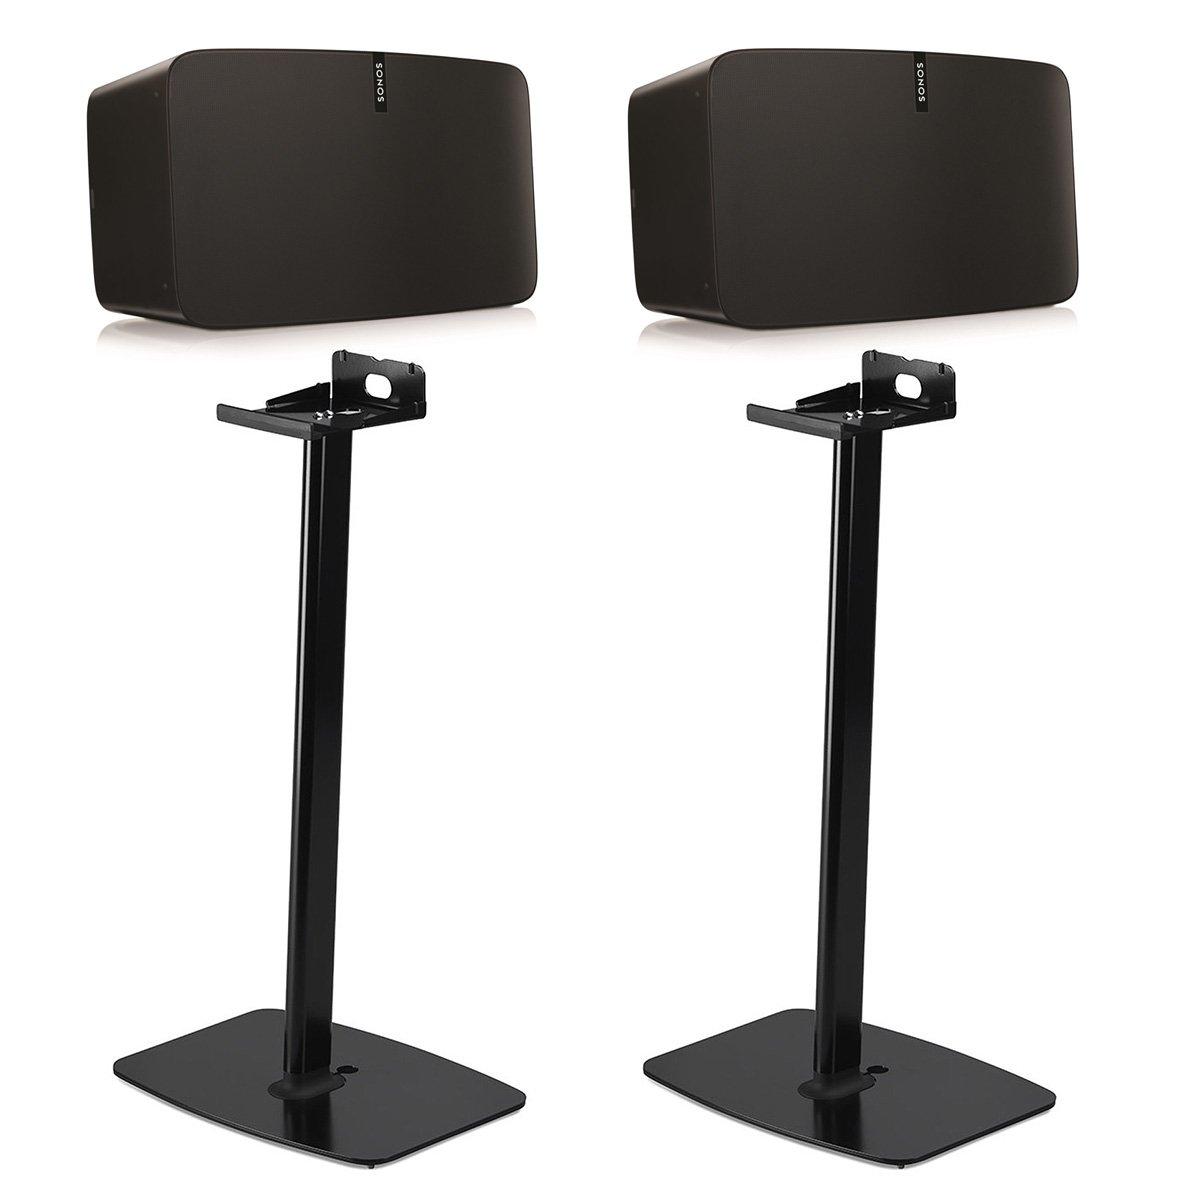 Sonos PLAY:5 Wireless Smart Speakers with Flexson Horizontal Floor Stands - Pair (Black)